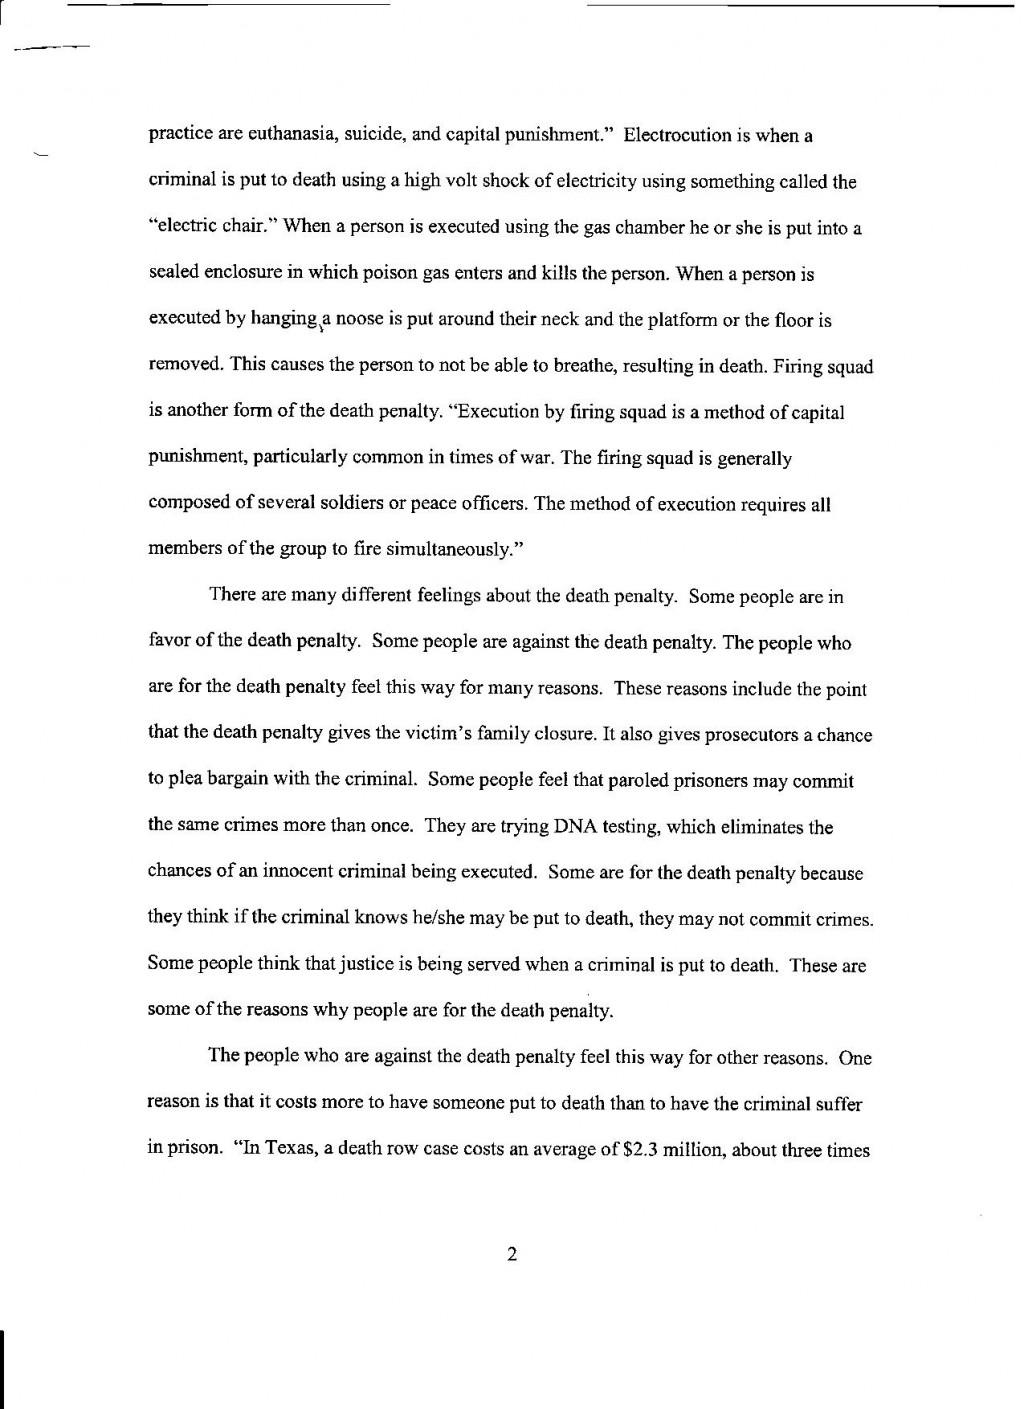 005 Essay Example Pro Death Penalty Essays Persuasive Conclusion Quotes Paragraph Fearsome Con Debate Argumentative Outline Large